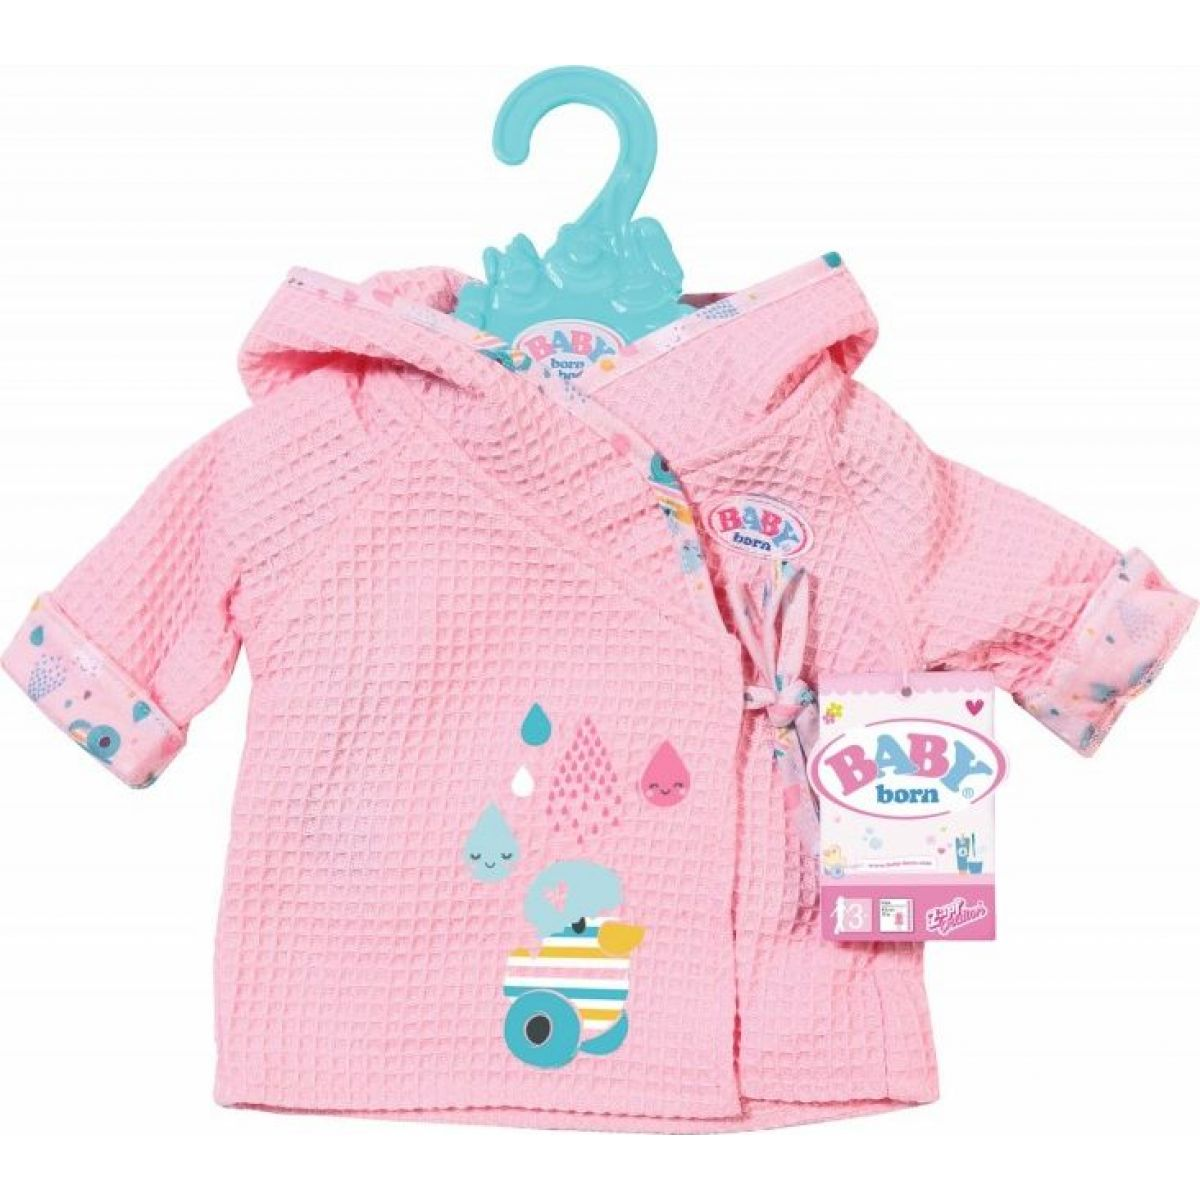 Zapf Creation Baby born ® Župan ružový